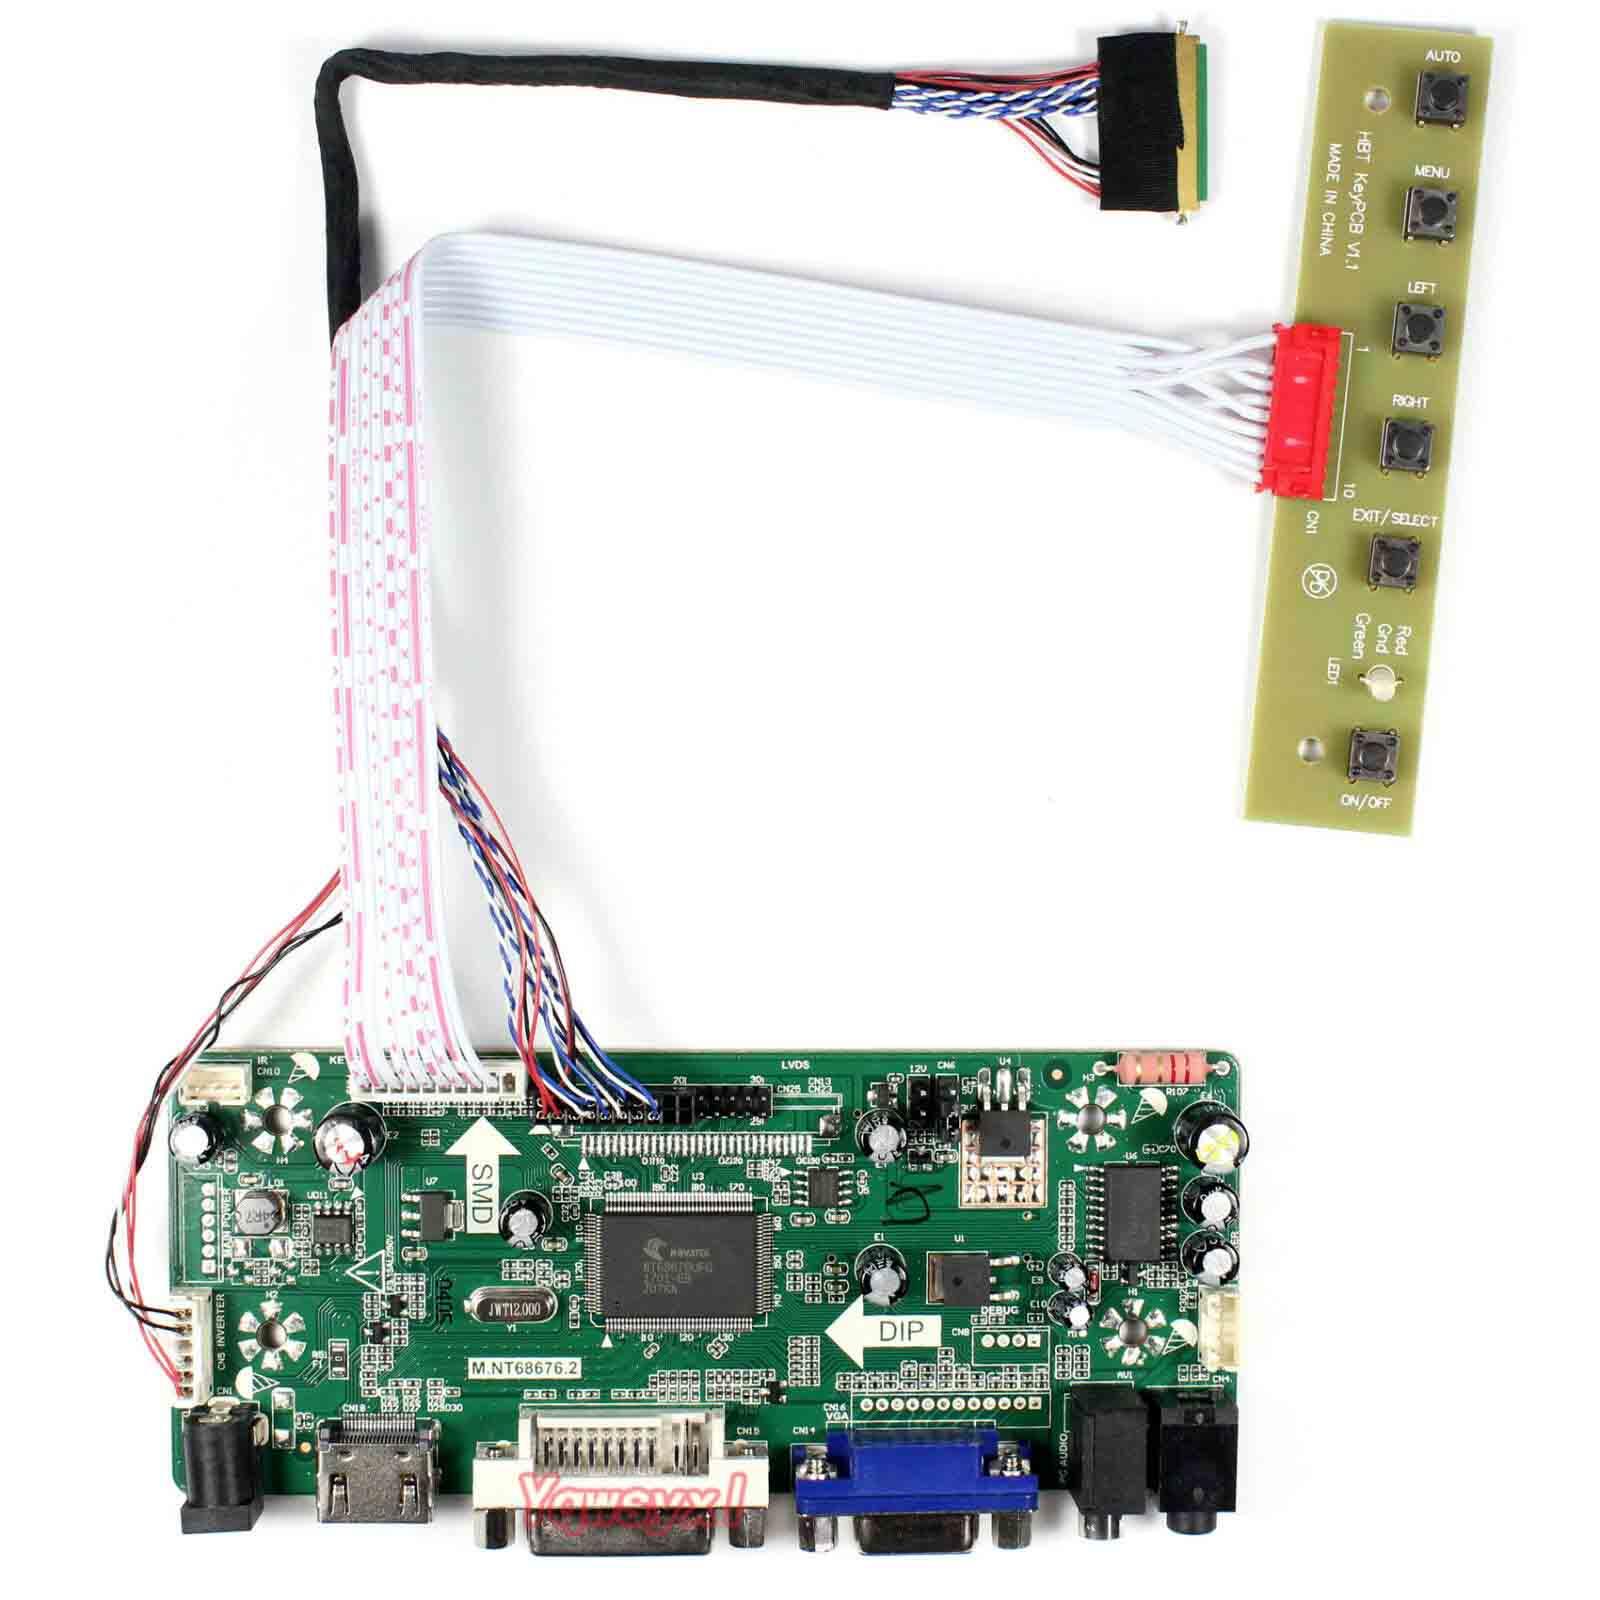 Yqwsyxl Control Monitor Kit para N140BGE-L33 N140BGE-L42 N140BGE-LB3 + HDMI + DVI + VGA LCD pantalla LED Placa de controlador conductor